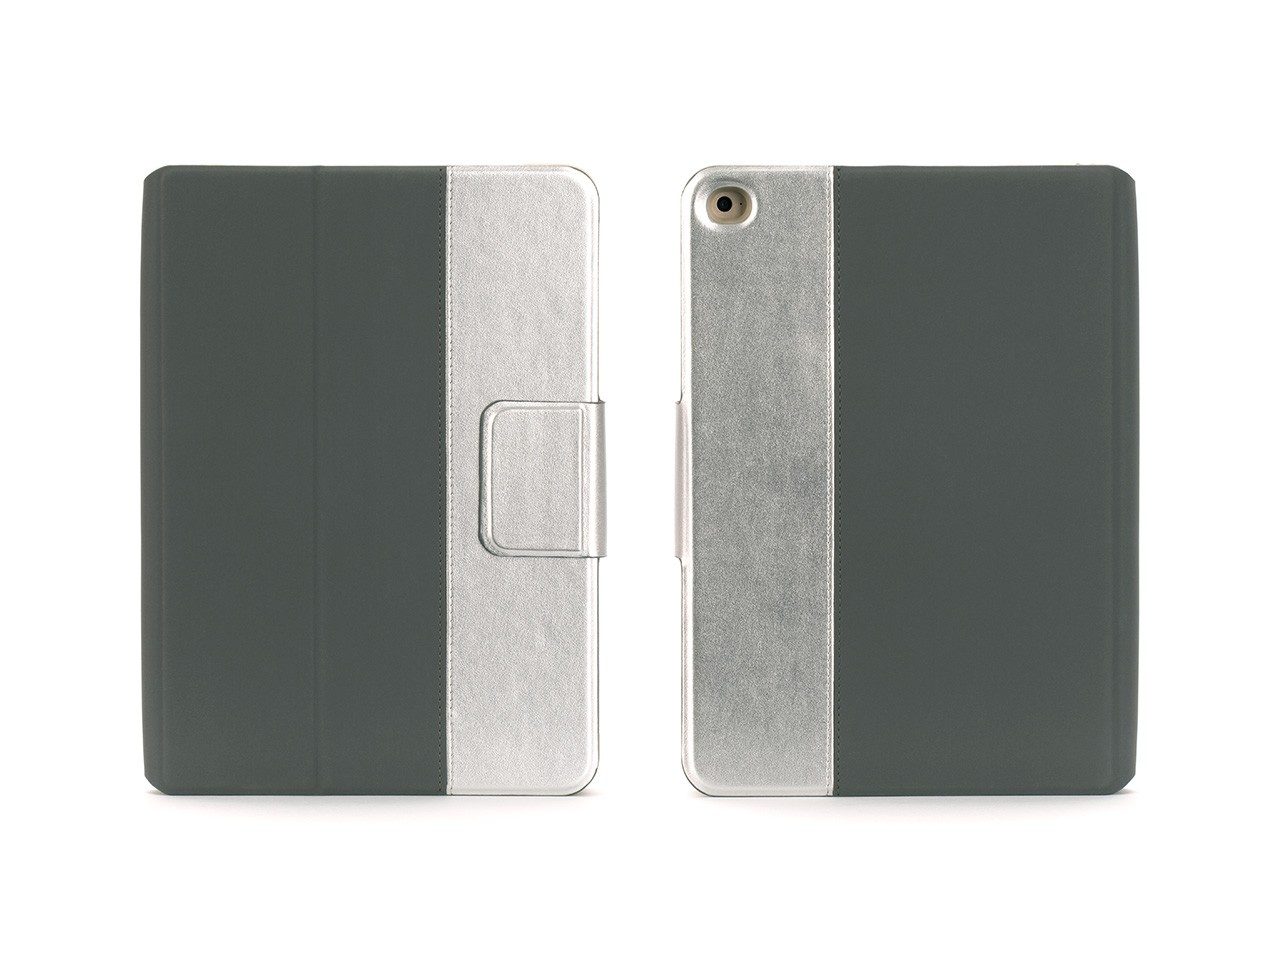 Nickel TurnFolio Rotating multi-positional Case for iPad Air 2